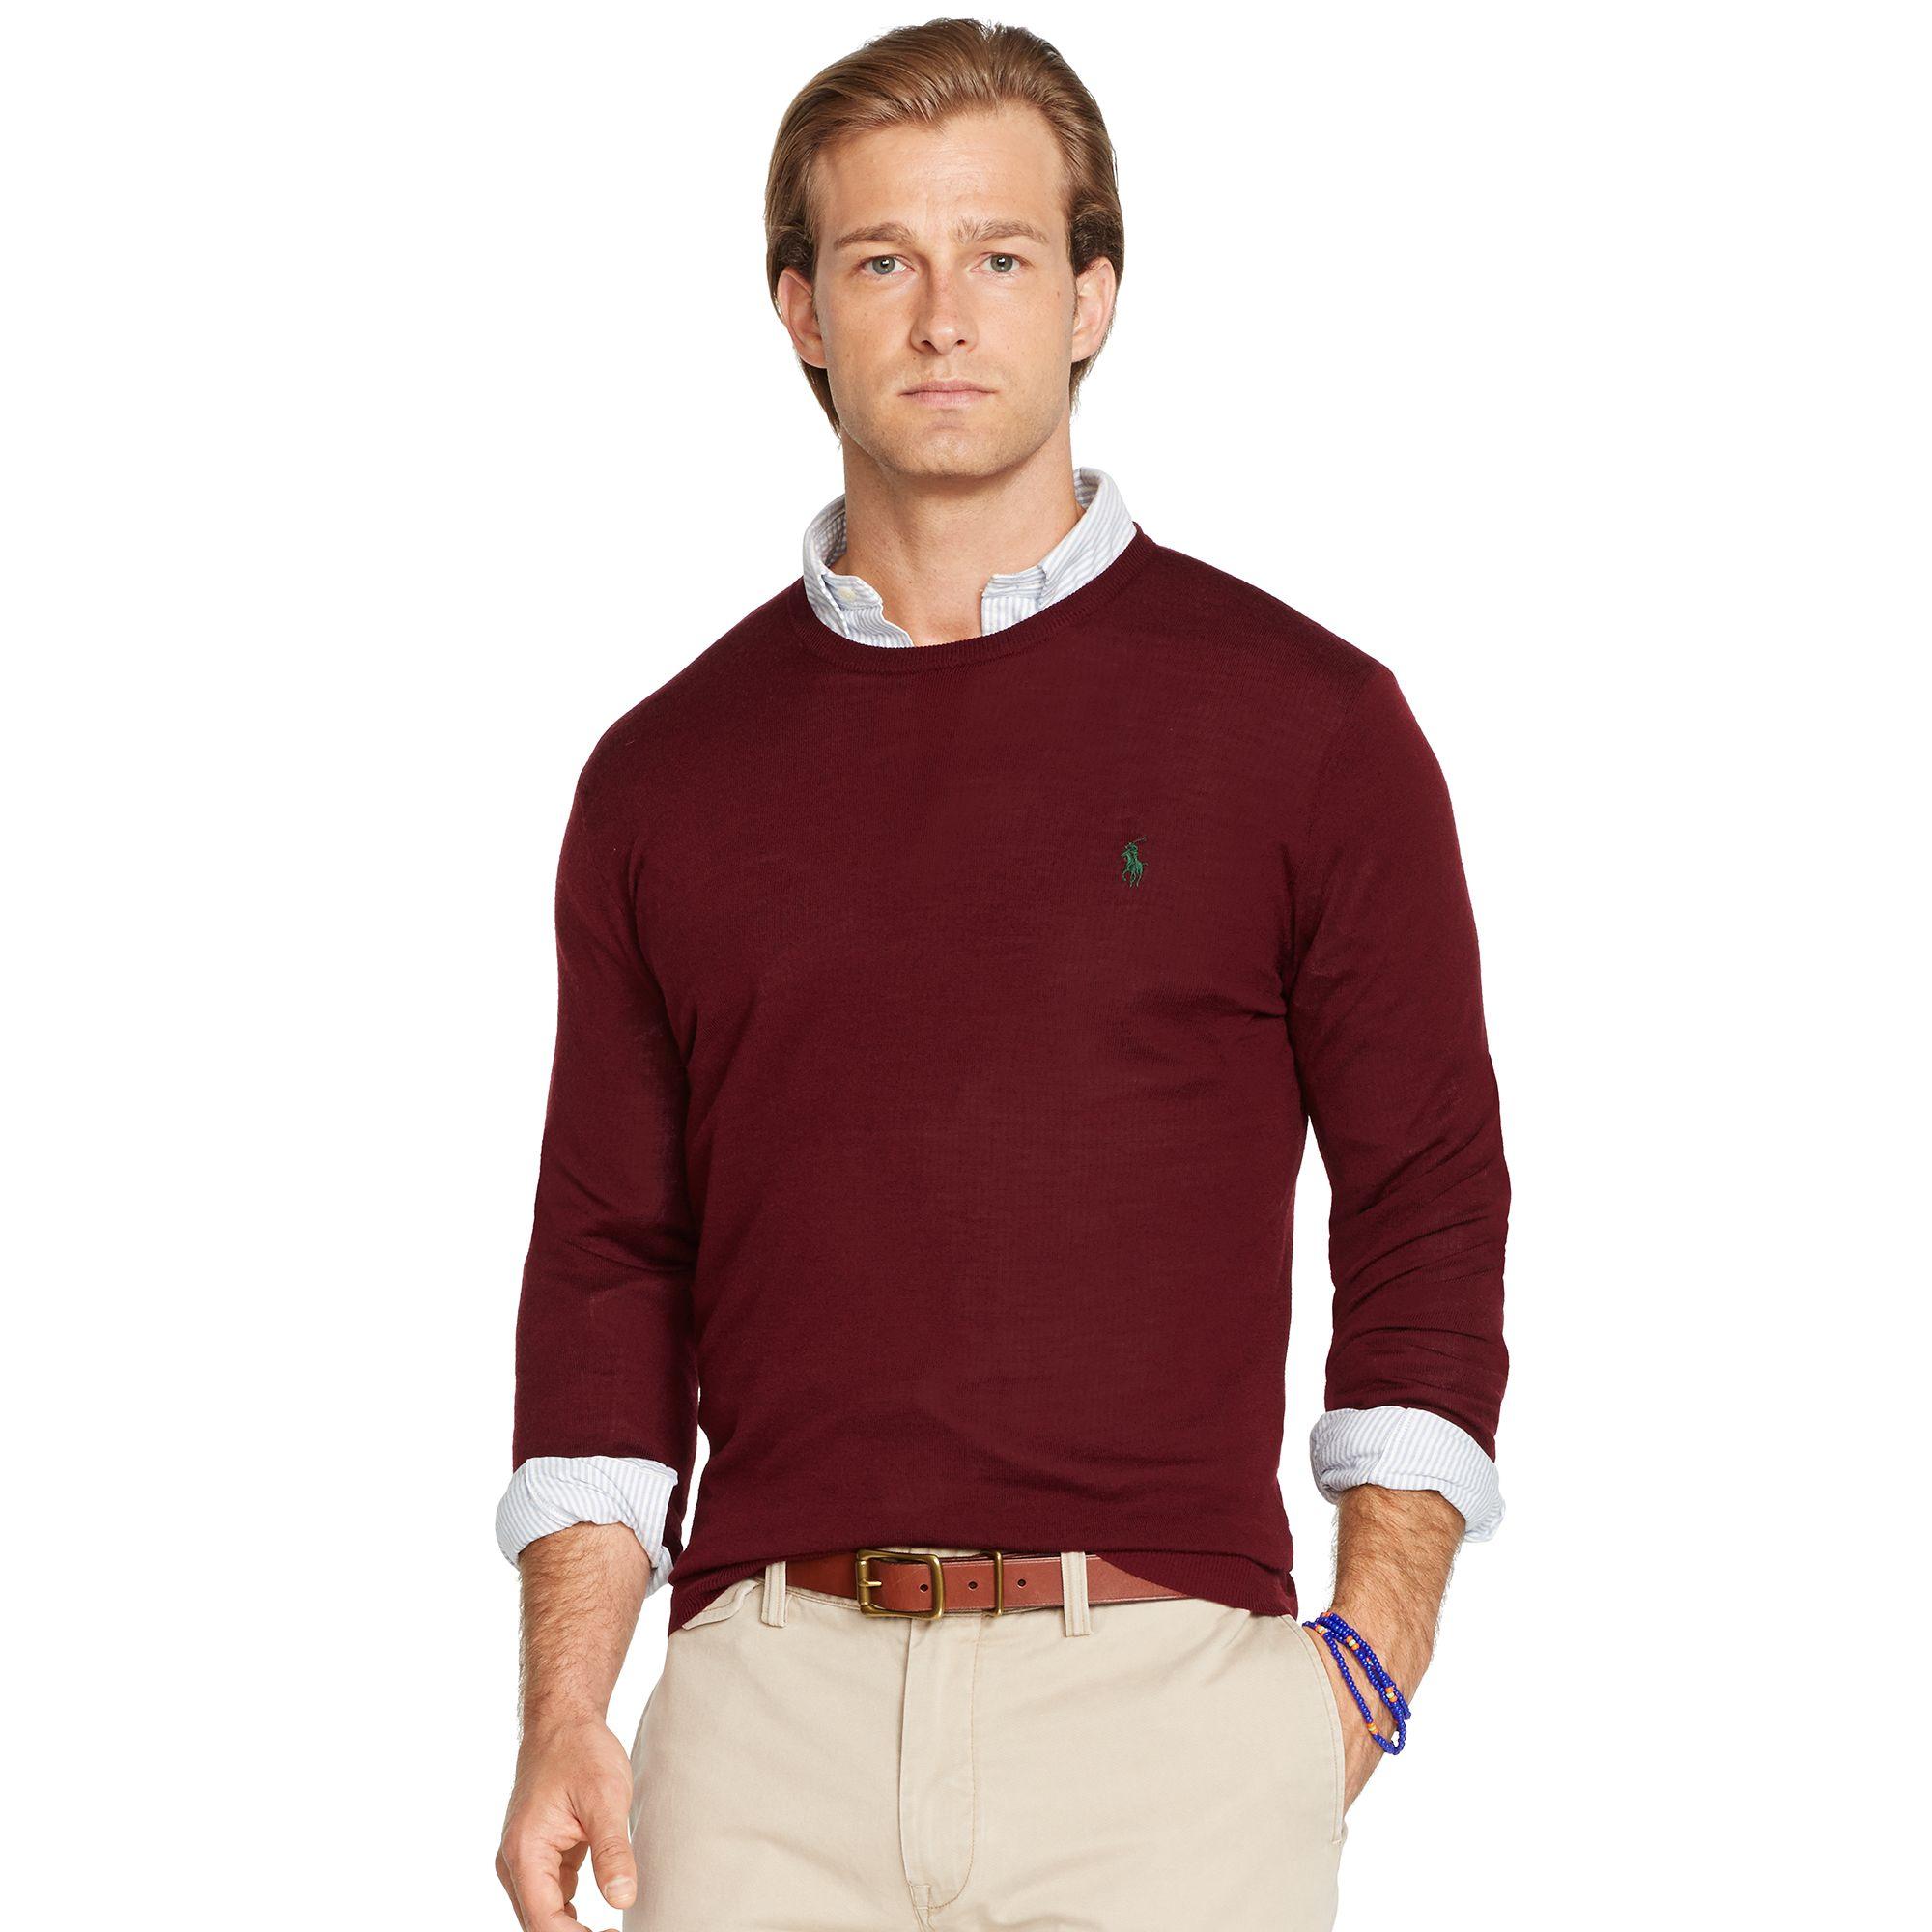 Slim Red Crewneck In For Fit Lyst Lauren Polo Men Ralph Sweater 4AR5jL